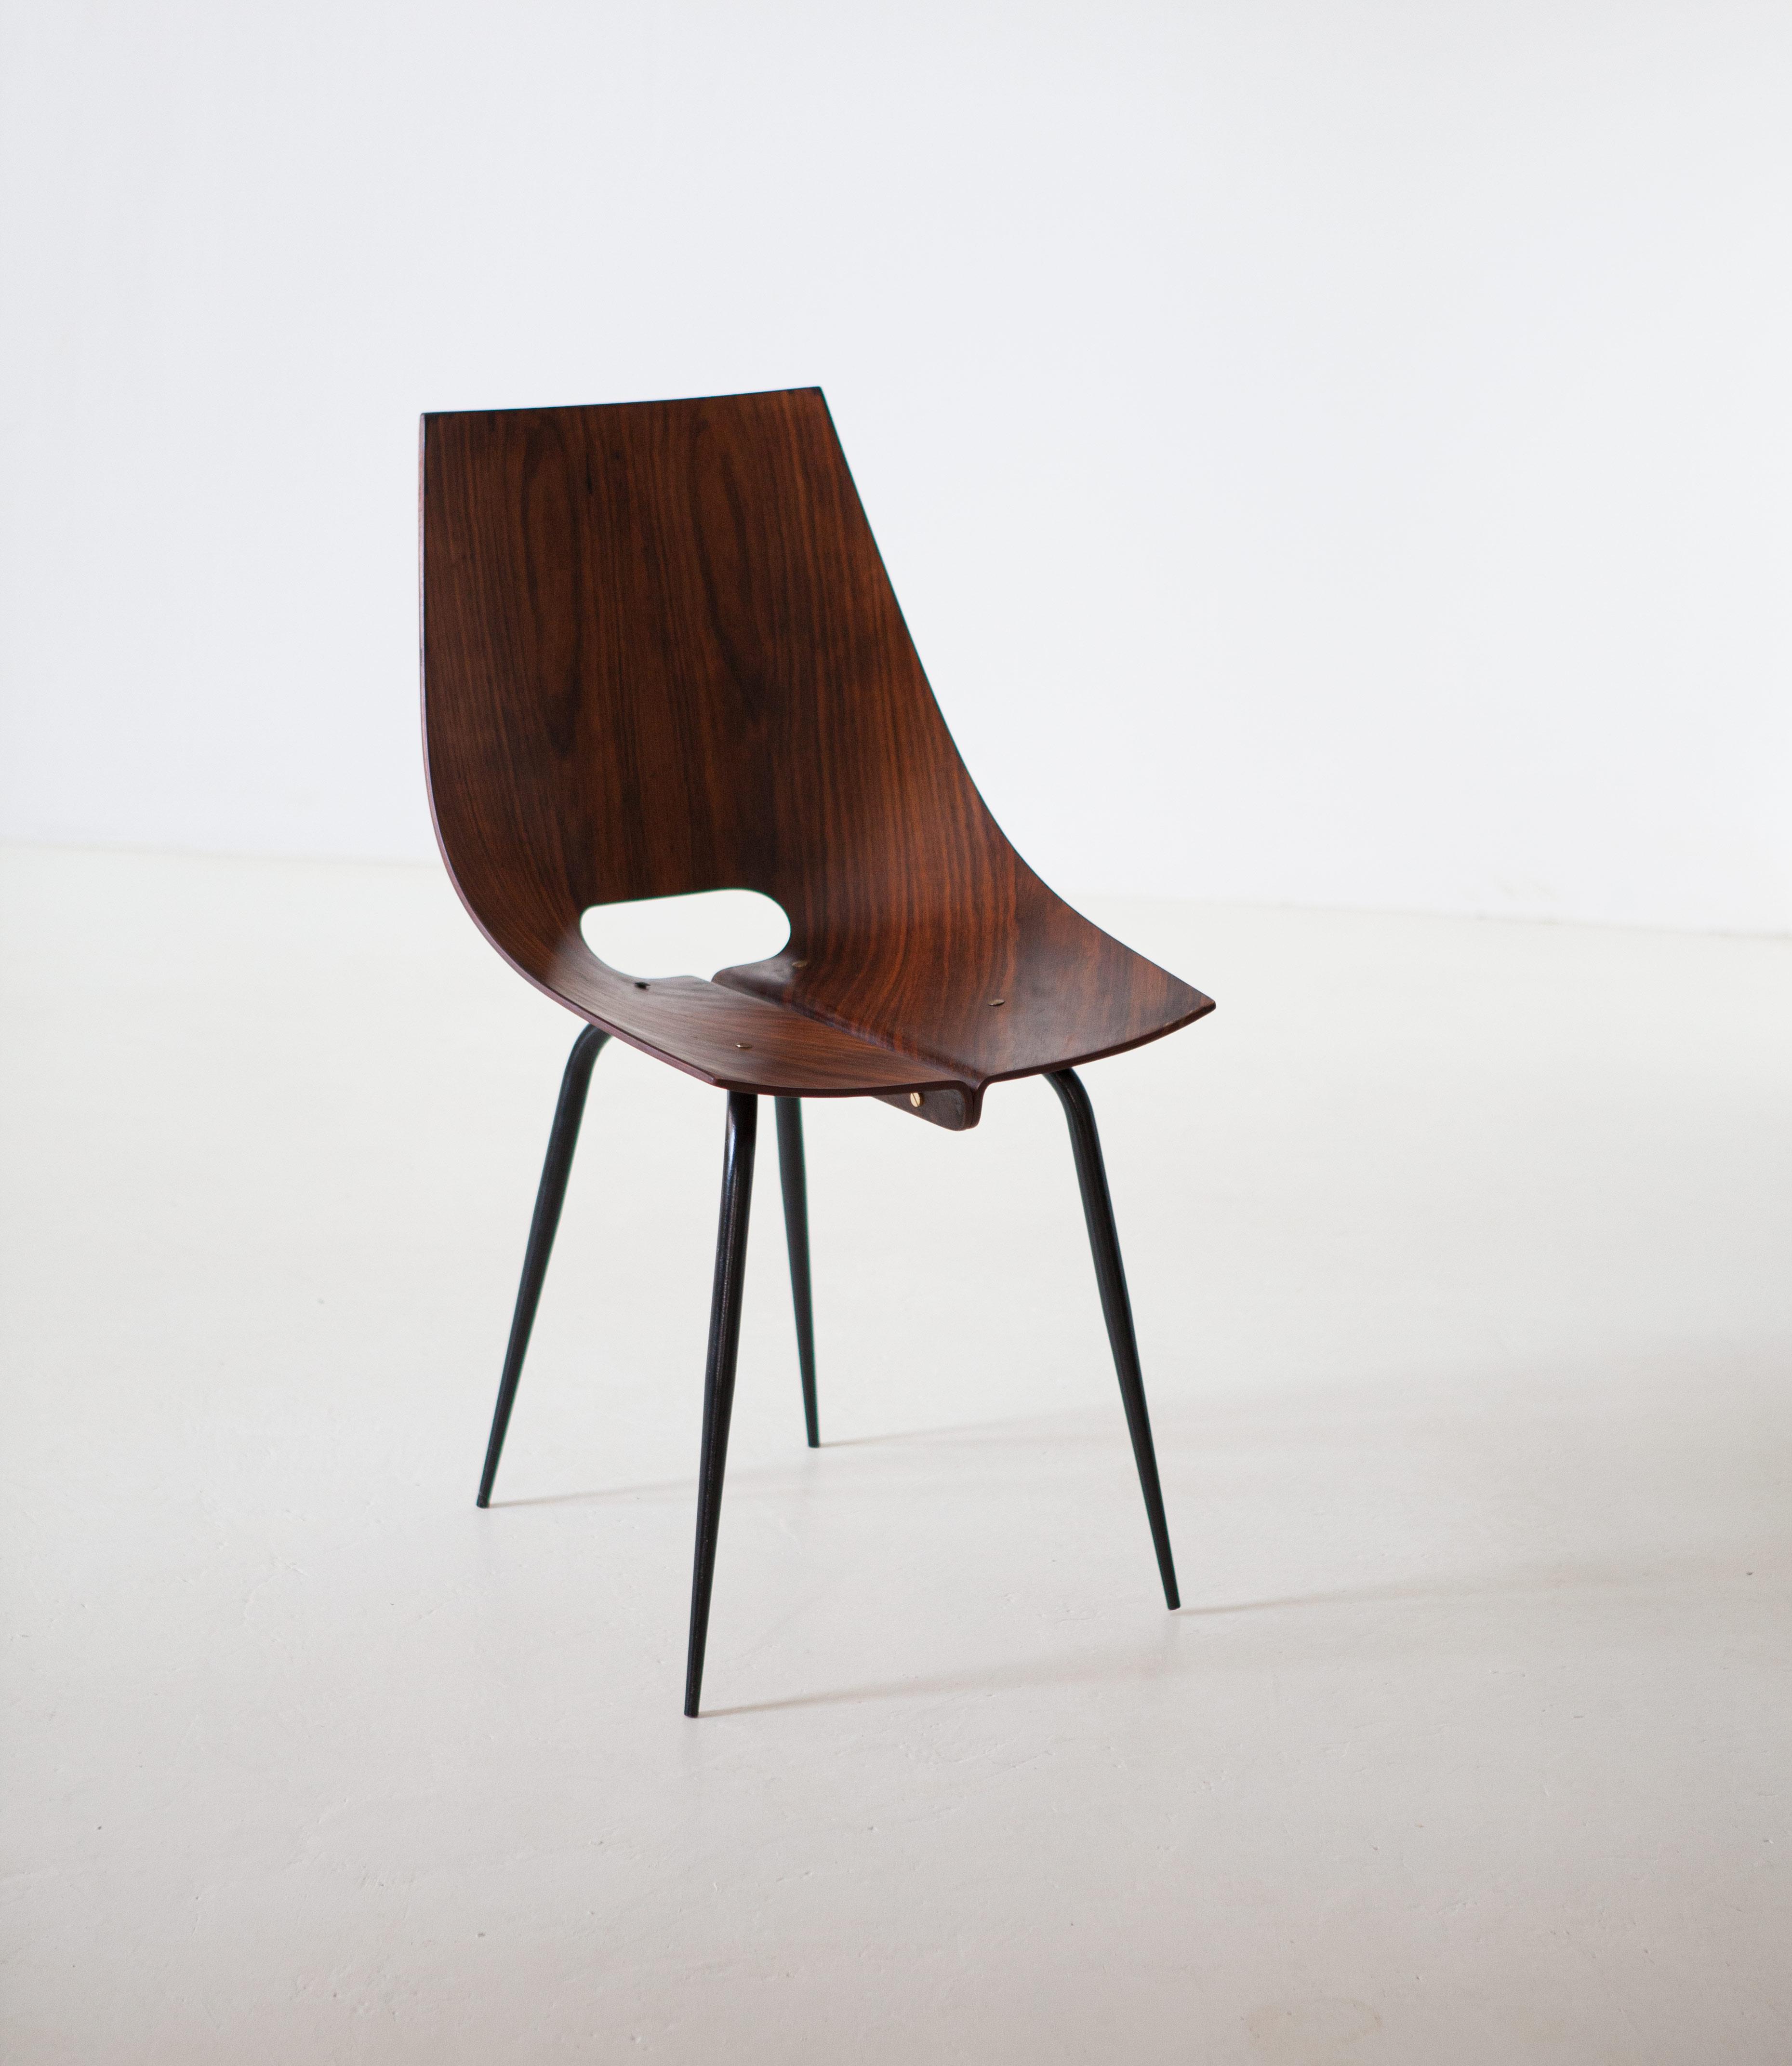 1950s-modern-curved-rosewood-chair-by-societa-compensati-curvati-2-se312.jpg